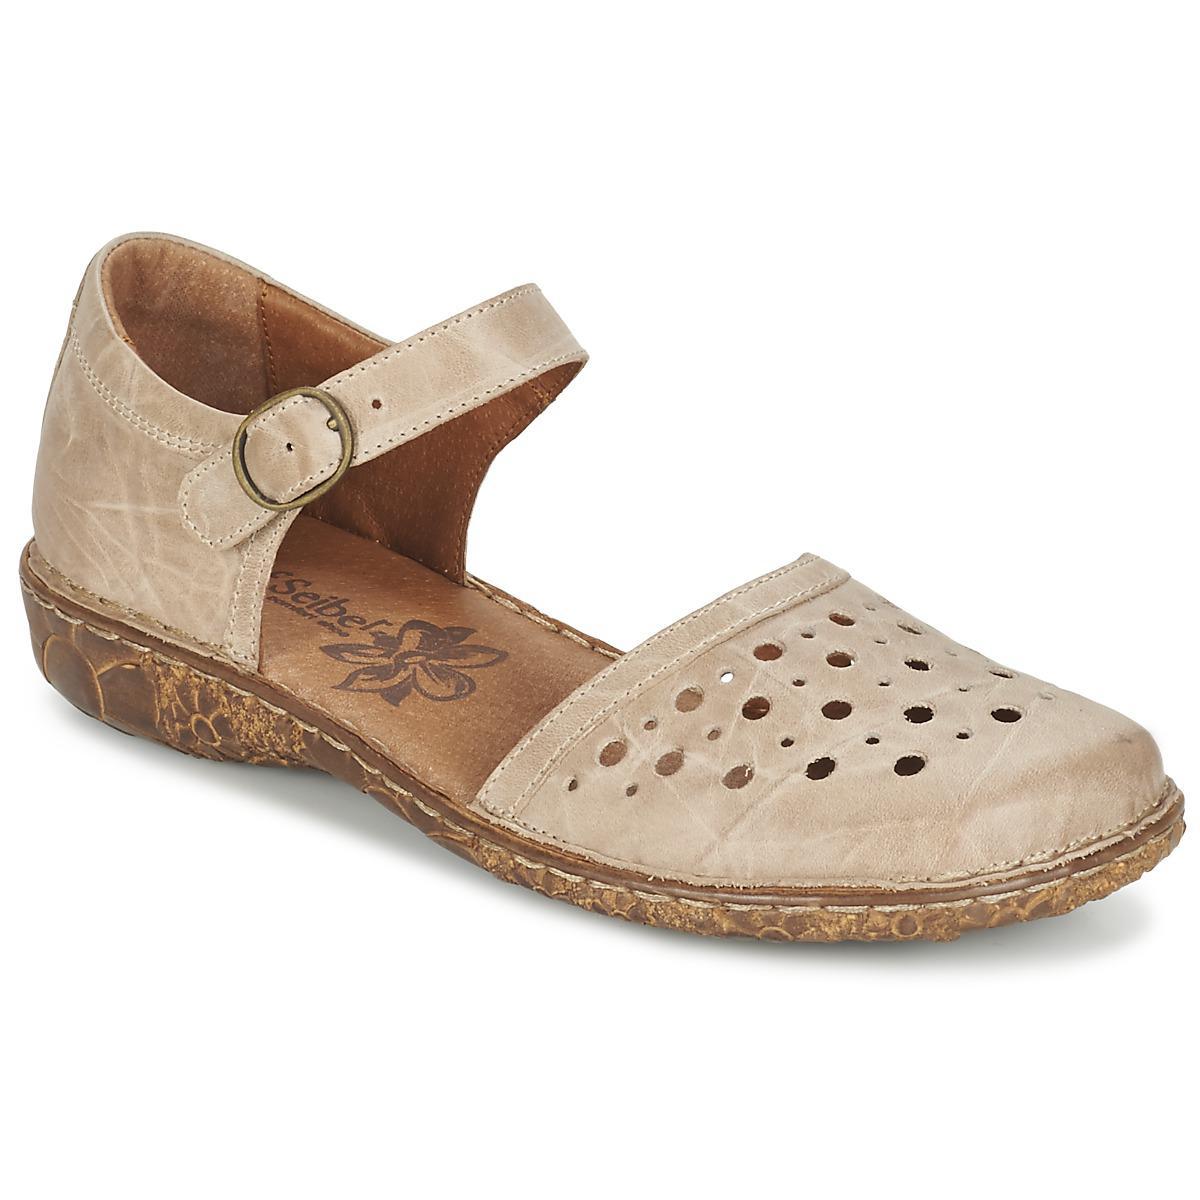 Josef Seibel Rosalie 19 Women s Sandals In Beige in Natural - Lyst a954ea77c5